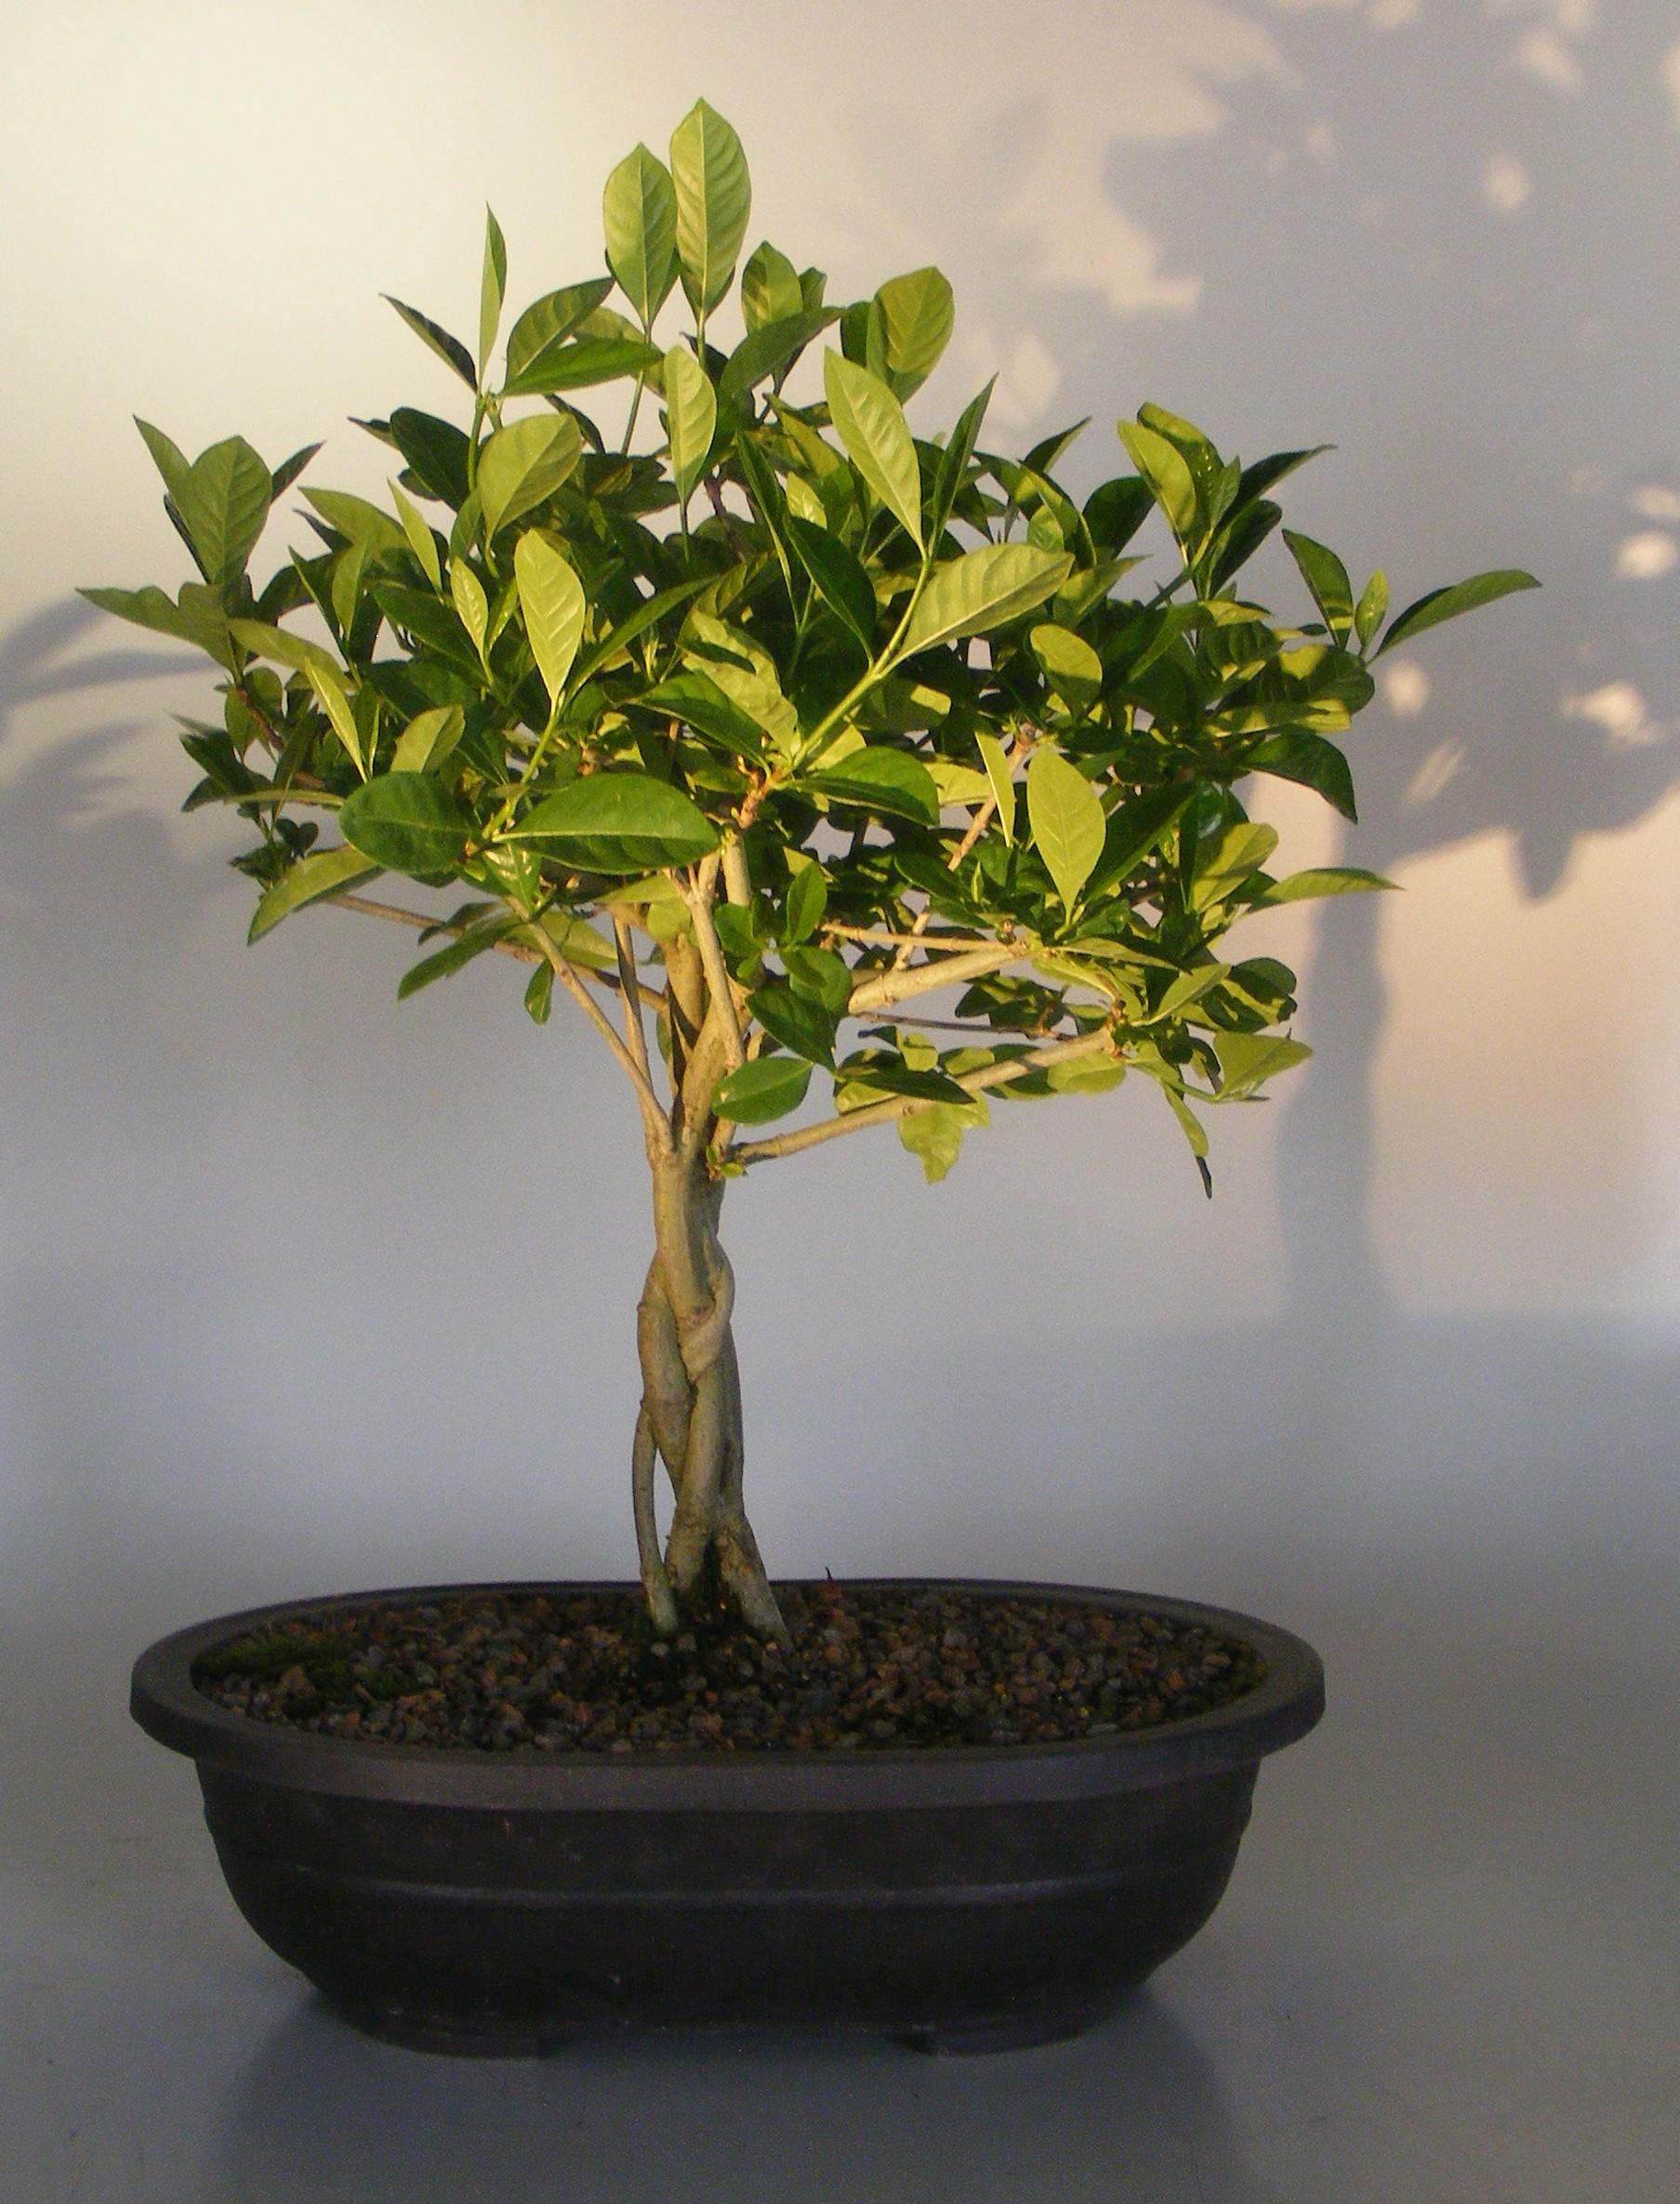 Flowering Gardenia Bonsai TreeBraided Trunk(jasminoides miami supreme) Image